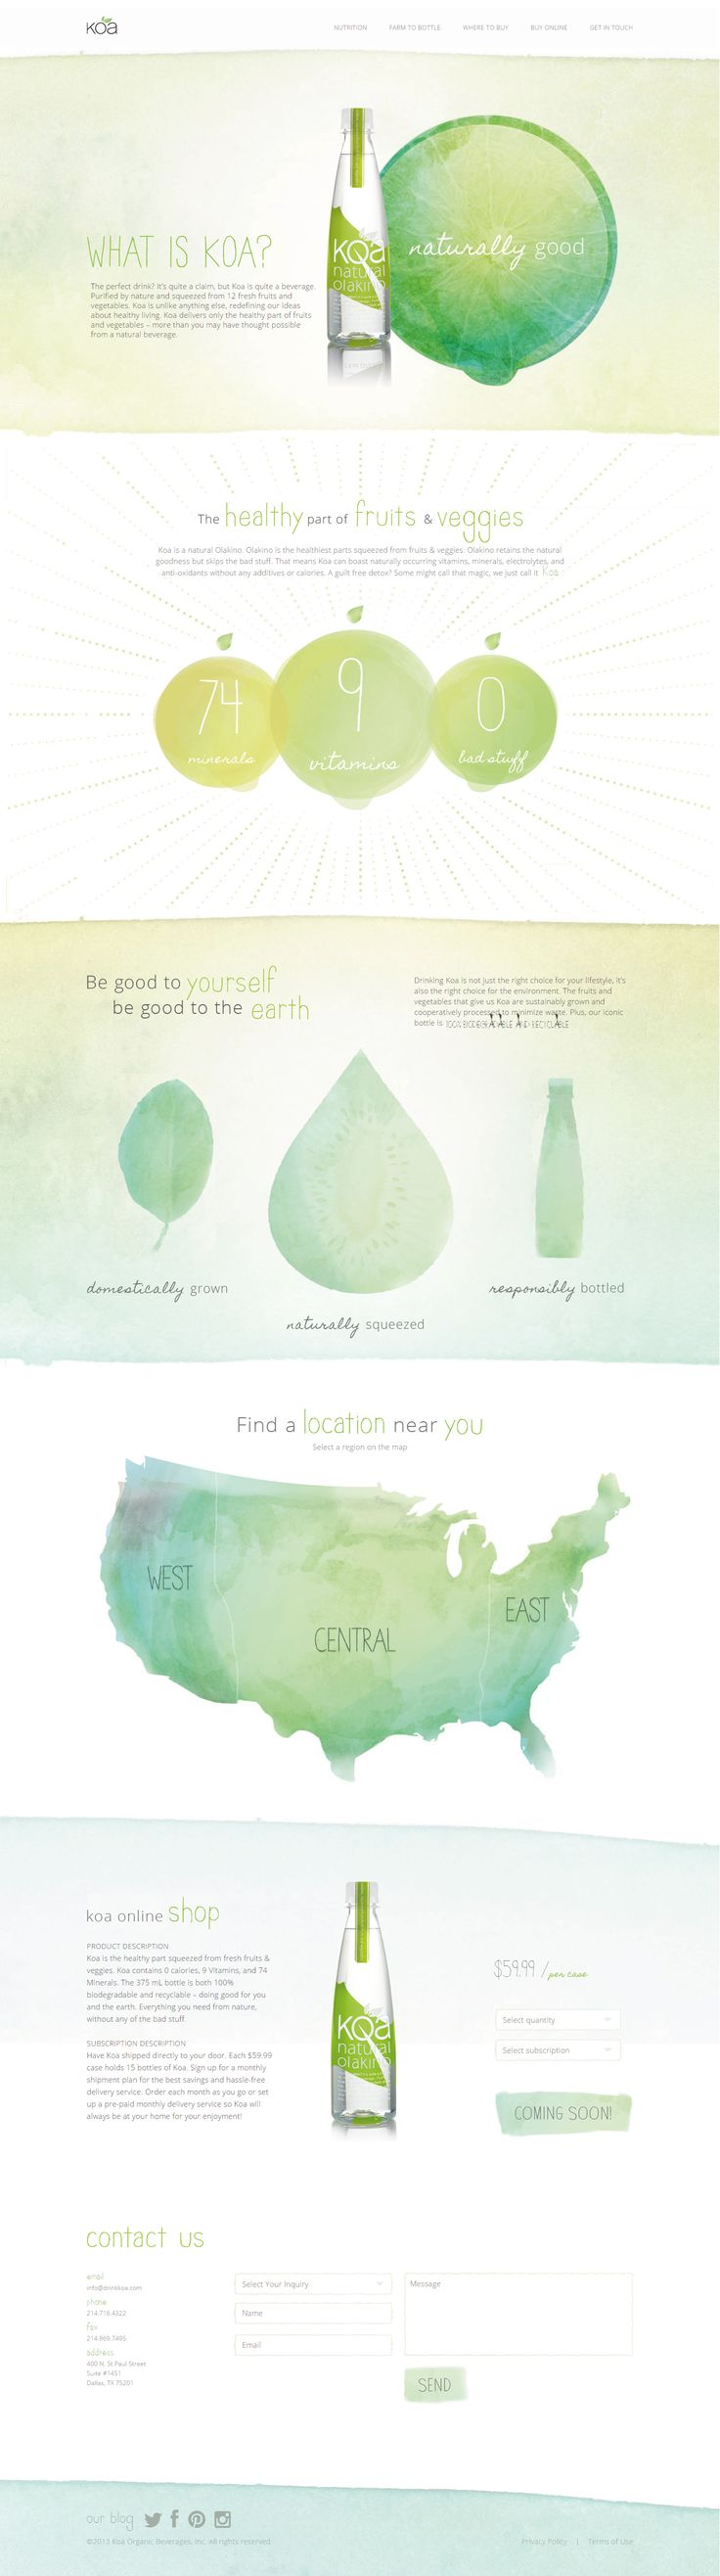 Unique Web Design, KOA Water http://www.drinkkoa.com/ by http://tractorbeam.com/ #Web #Design